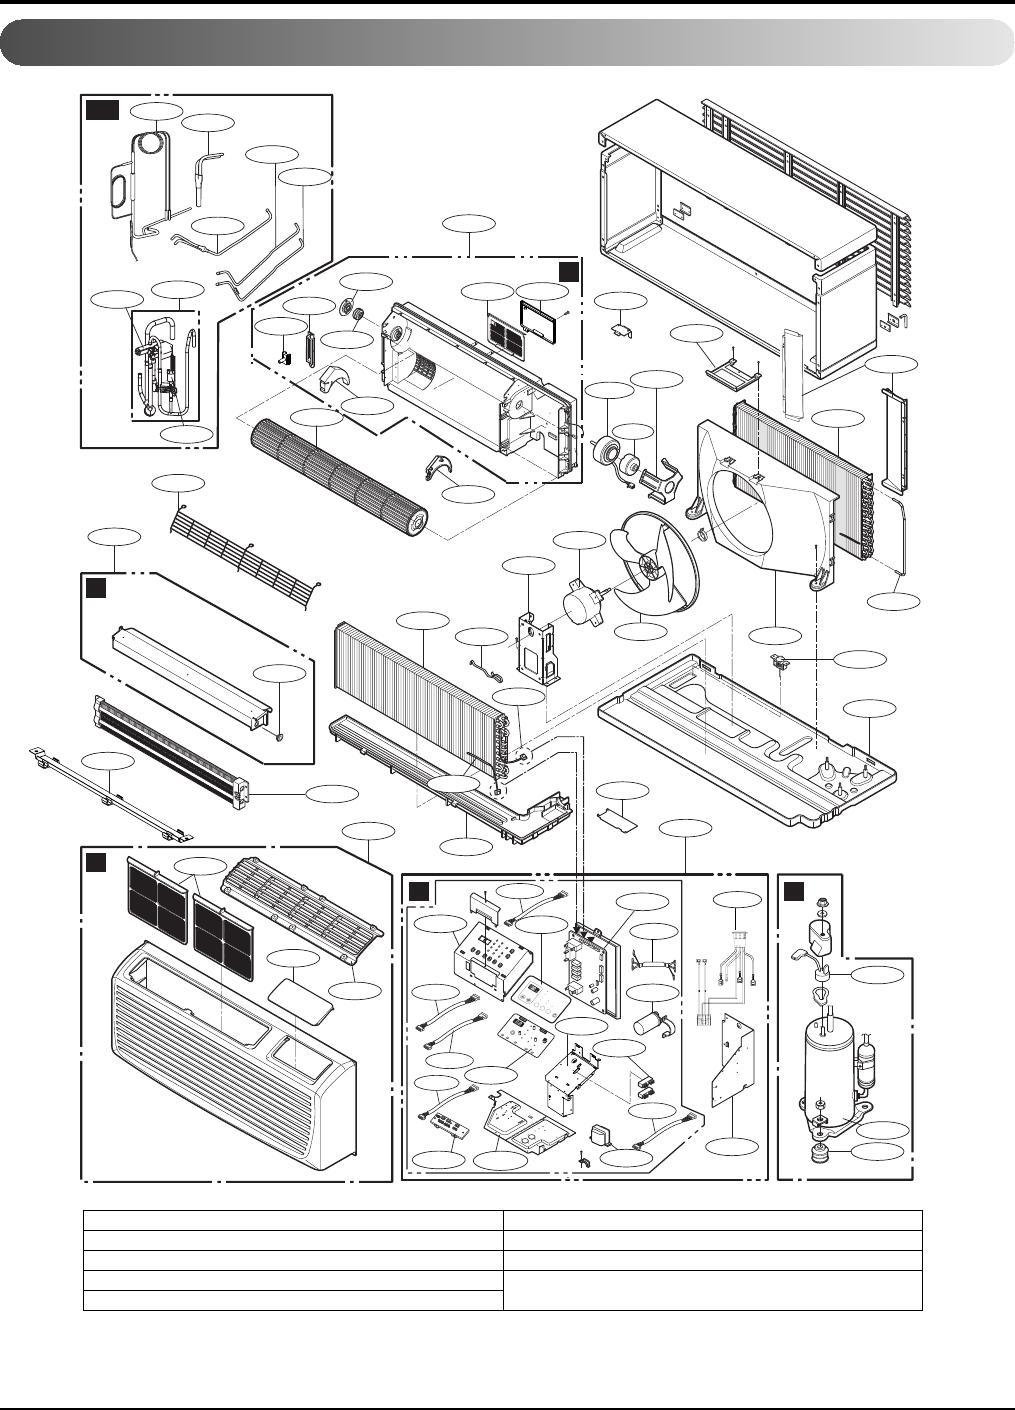 LG LP073HDUC/LP093HDUC/LP123HDUC/LP153HDUC User Manual